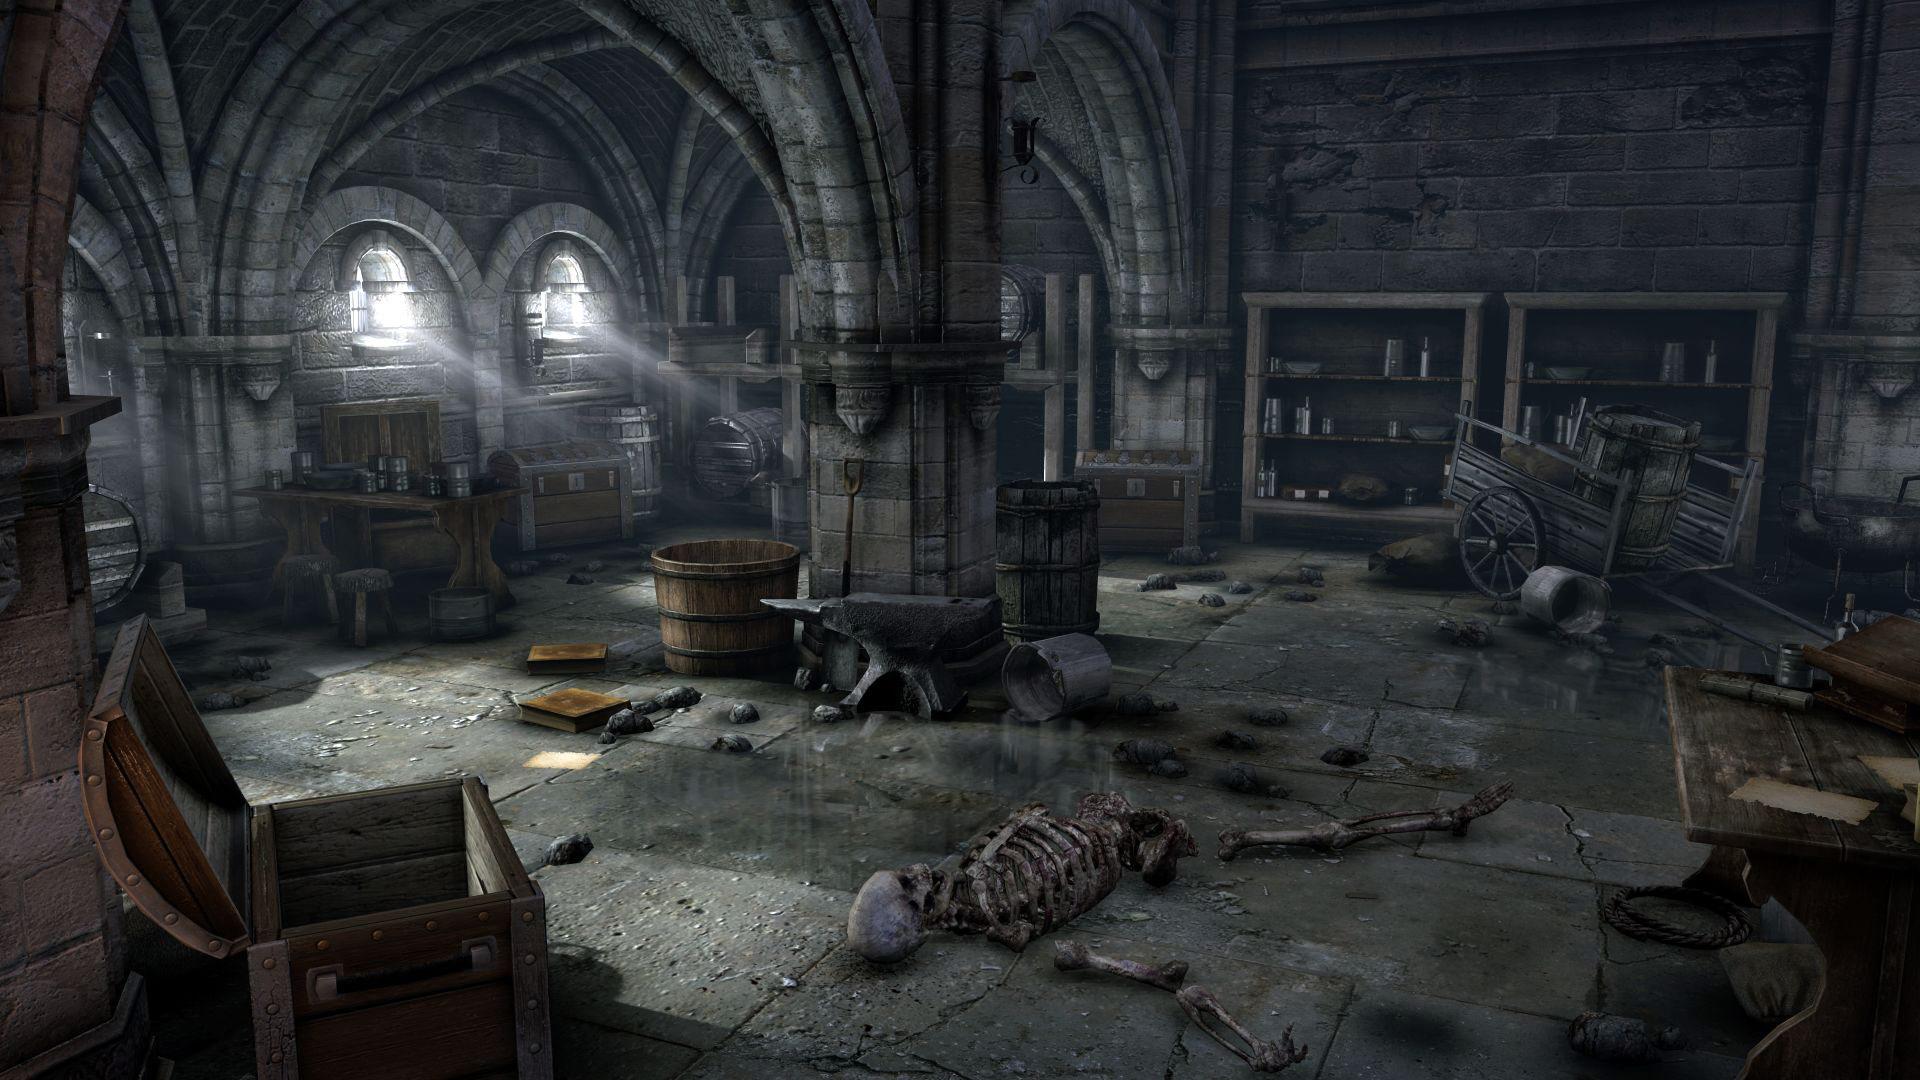 01_Monastery_Warehouse-noscale